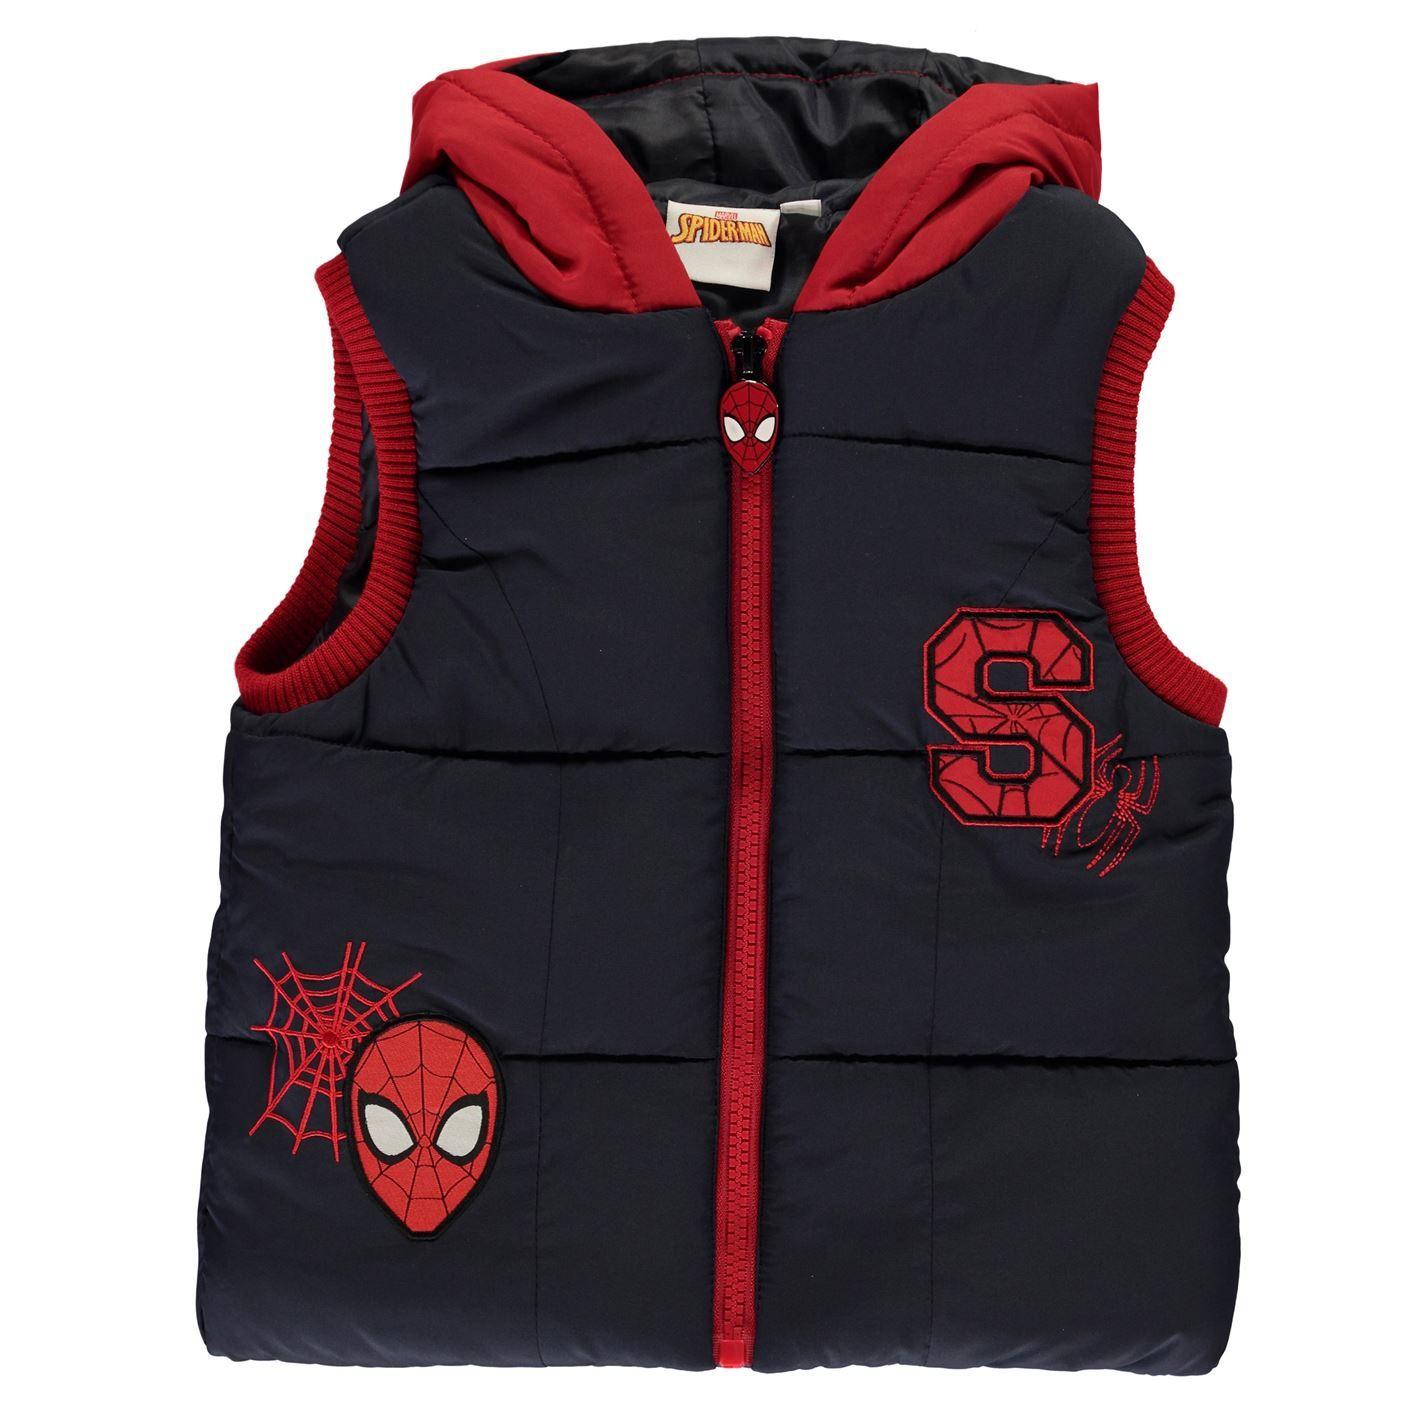 Character Boys Kids Gilet Set Full Zip Hooded T-Shirt Joggers Sports Lightweight